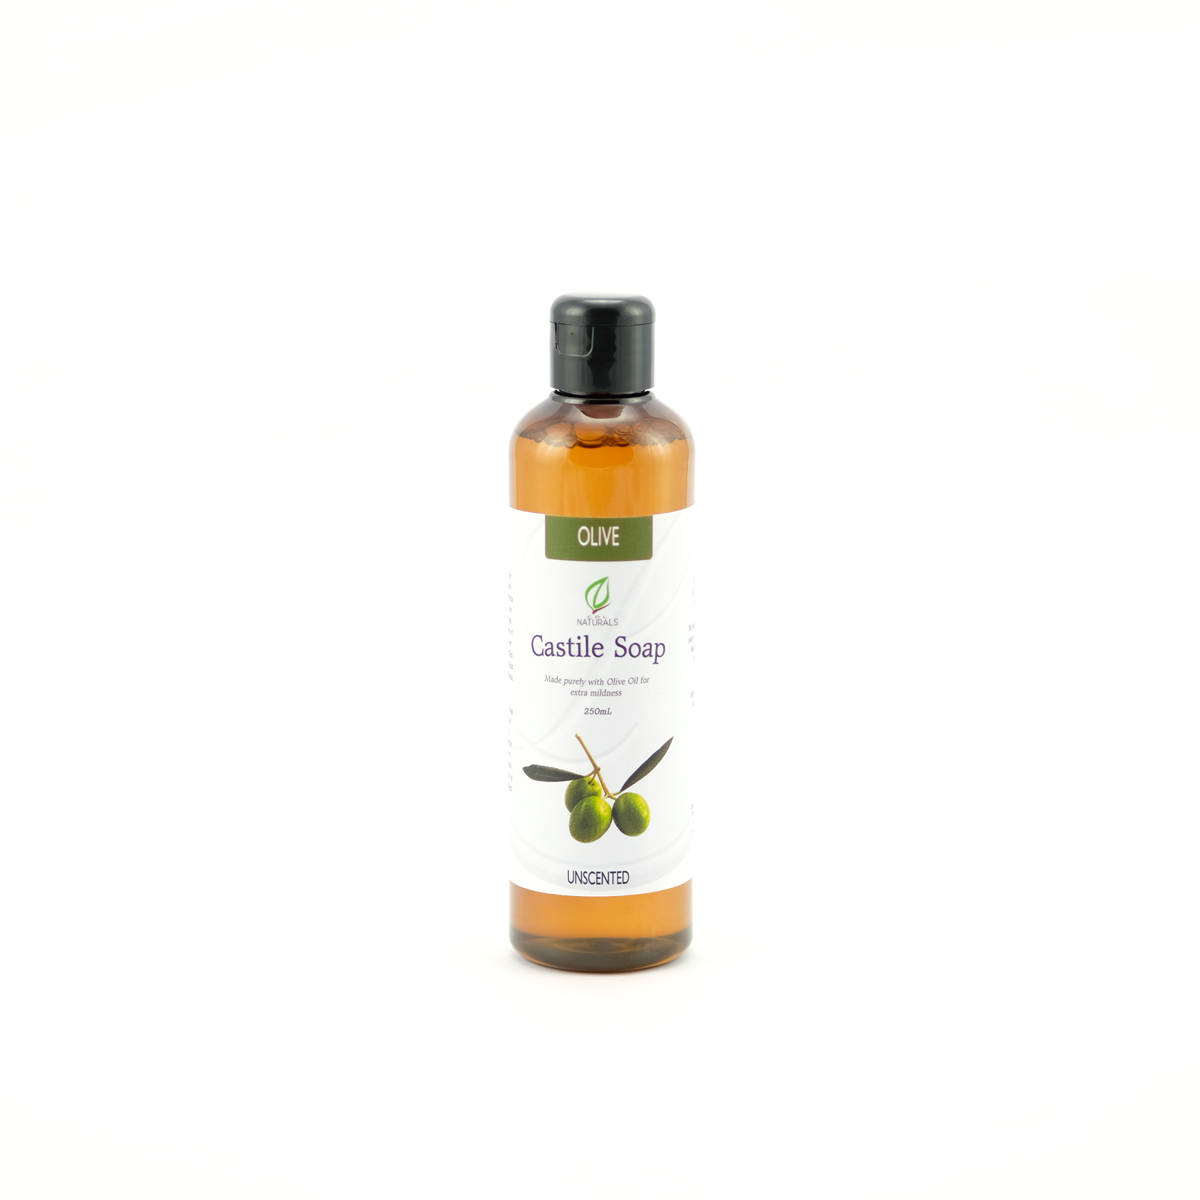 Unscented Olive Castile Soap Refill